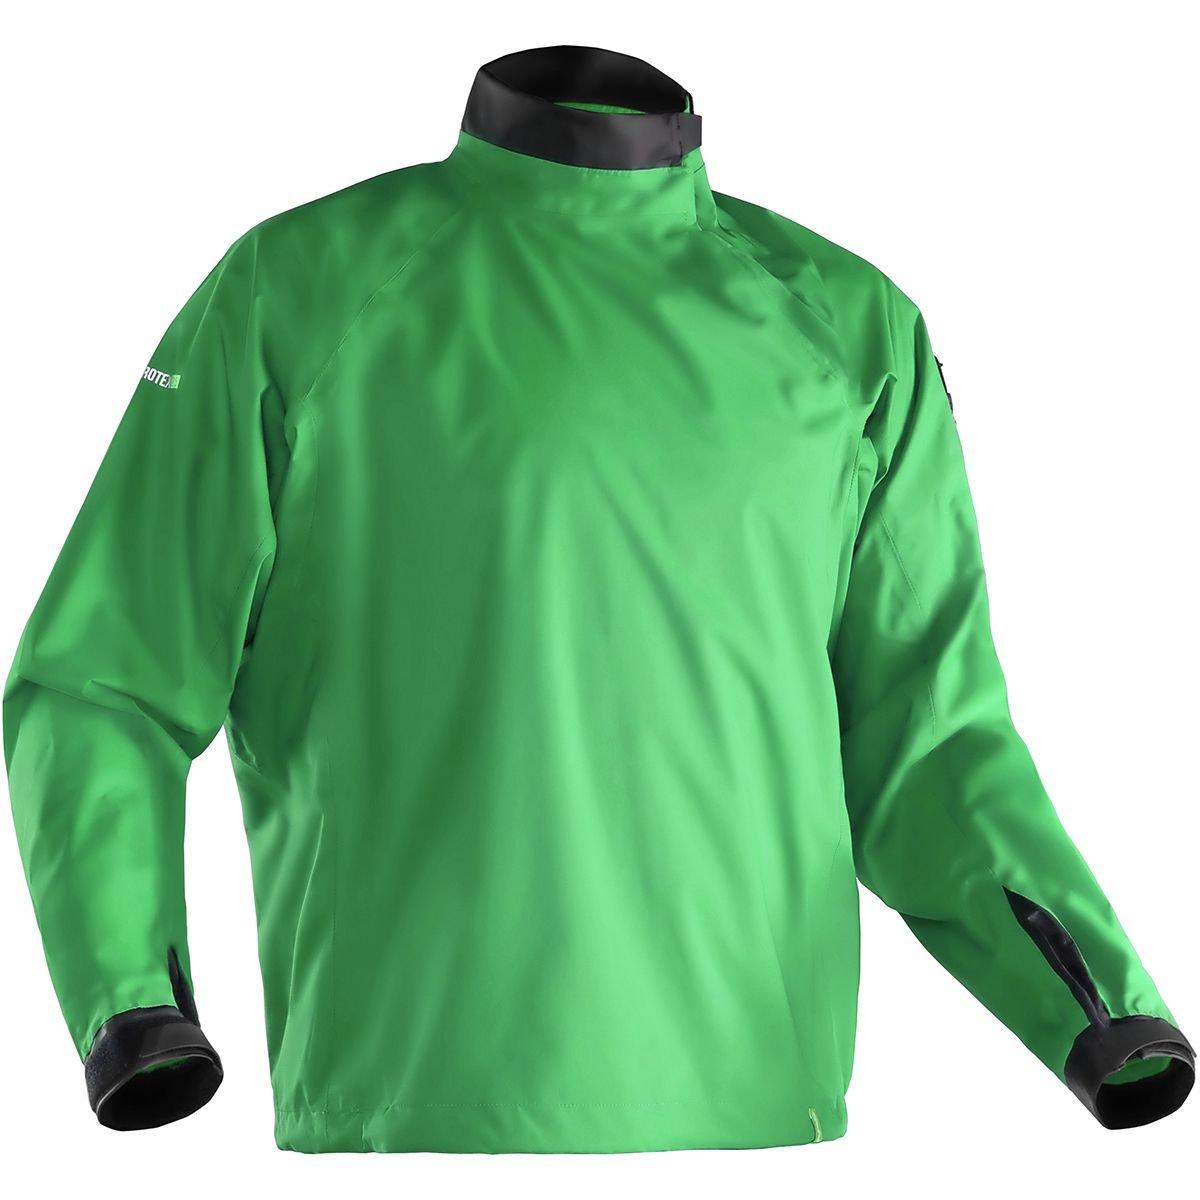 NRS Men's Endurance Paddling Jacket-Fern-XS